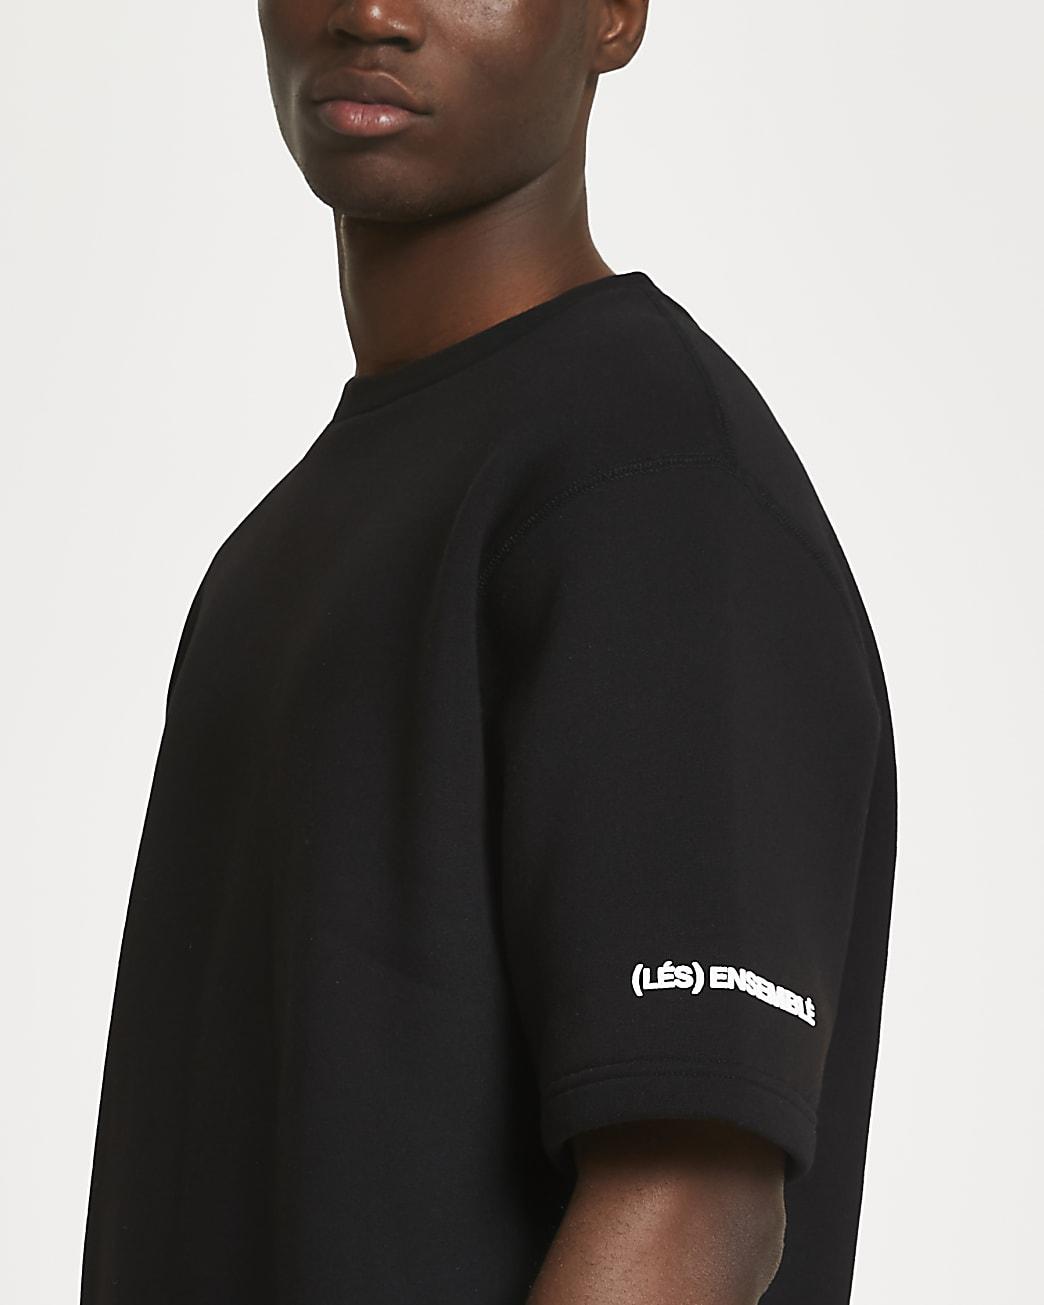 Black 'Les Ensembles' short sleeve sweatshirt